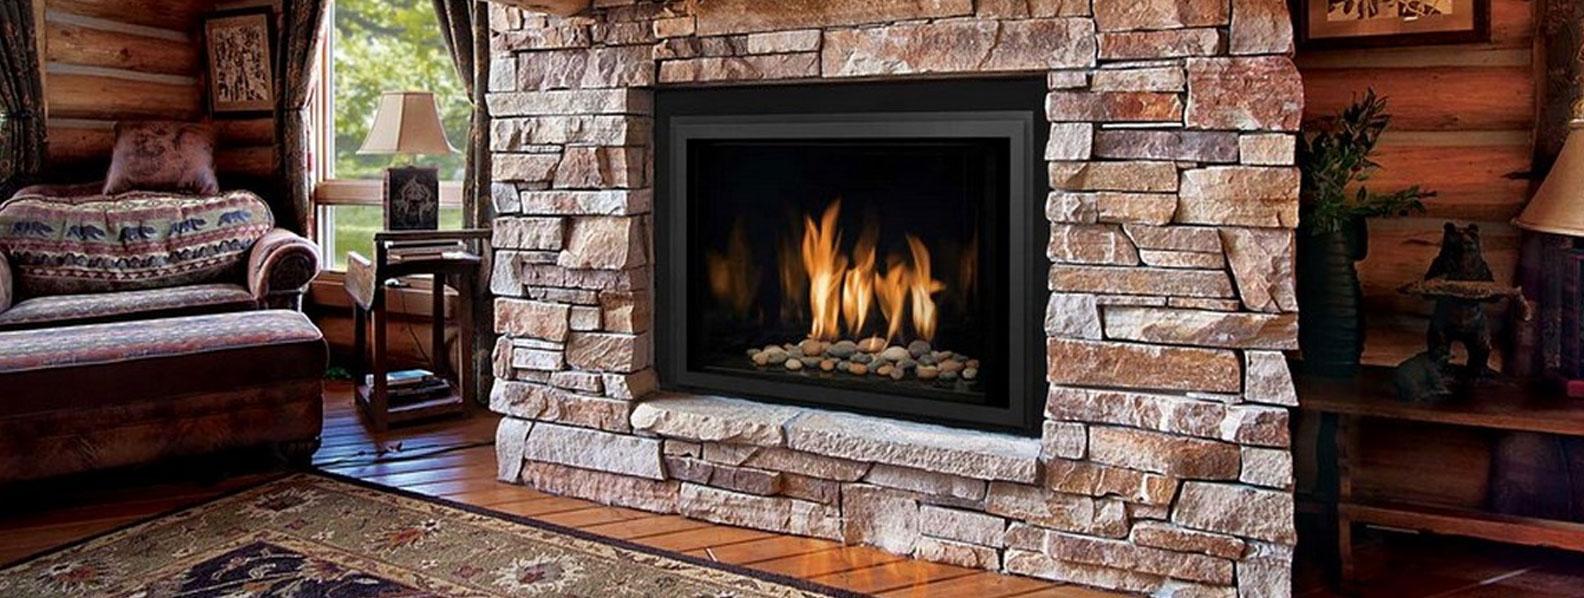 national fireplace institute nfi